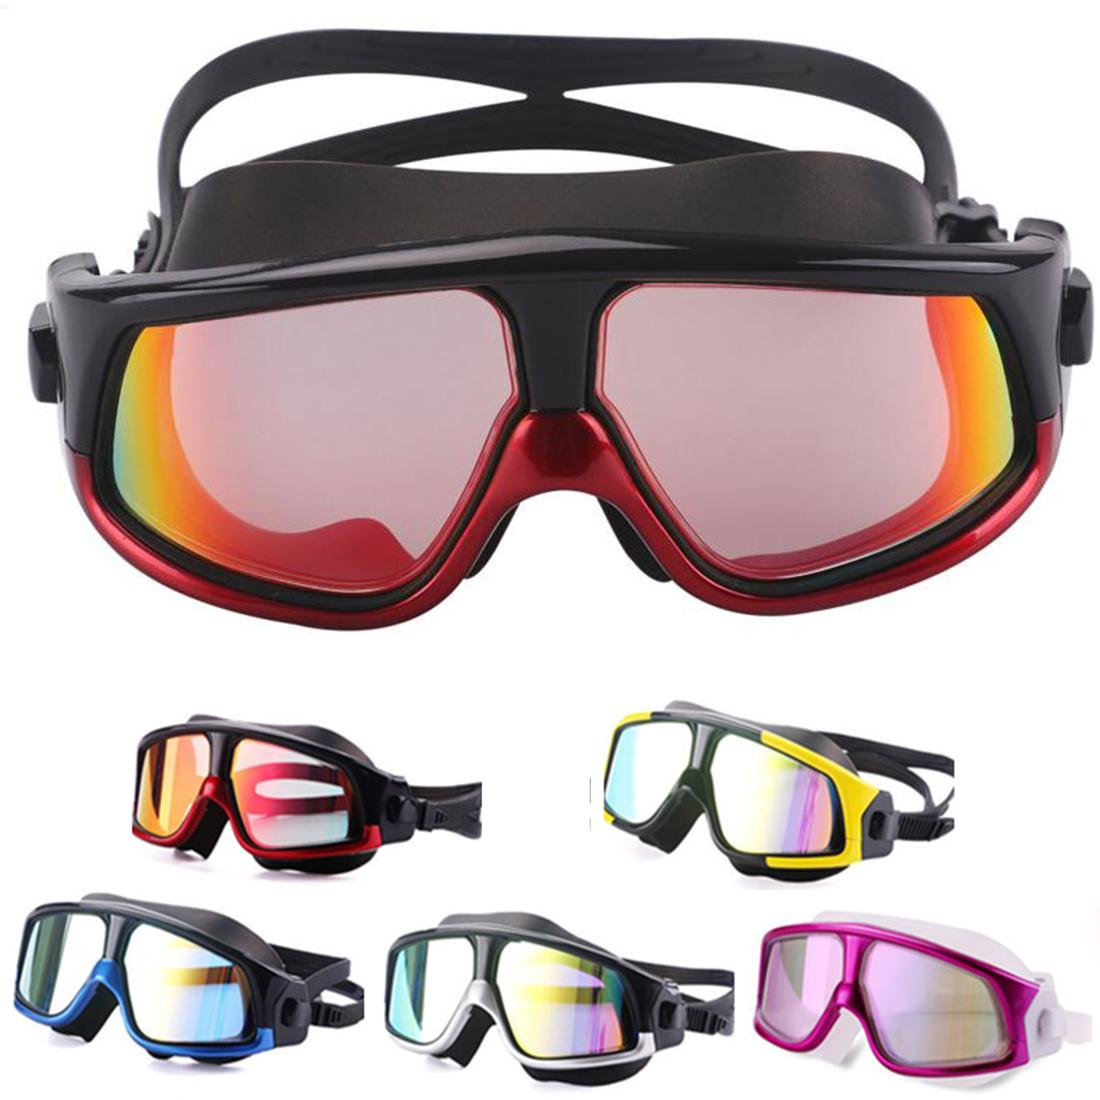 7beca1c1d424 2019 Comfortable Silicone Large Frame Swim Glasses Swimming Goggles Anti Fog  UV Men Women Swim Mask Waterproof From Jersey168